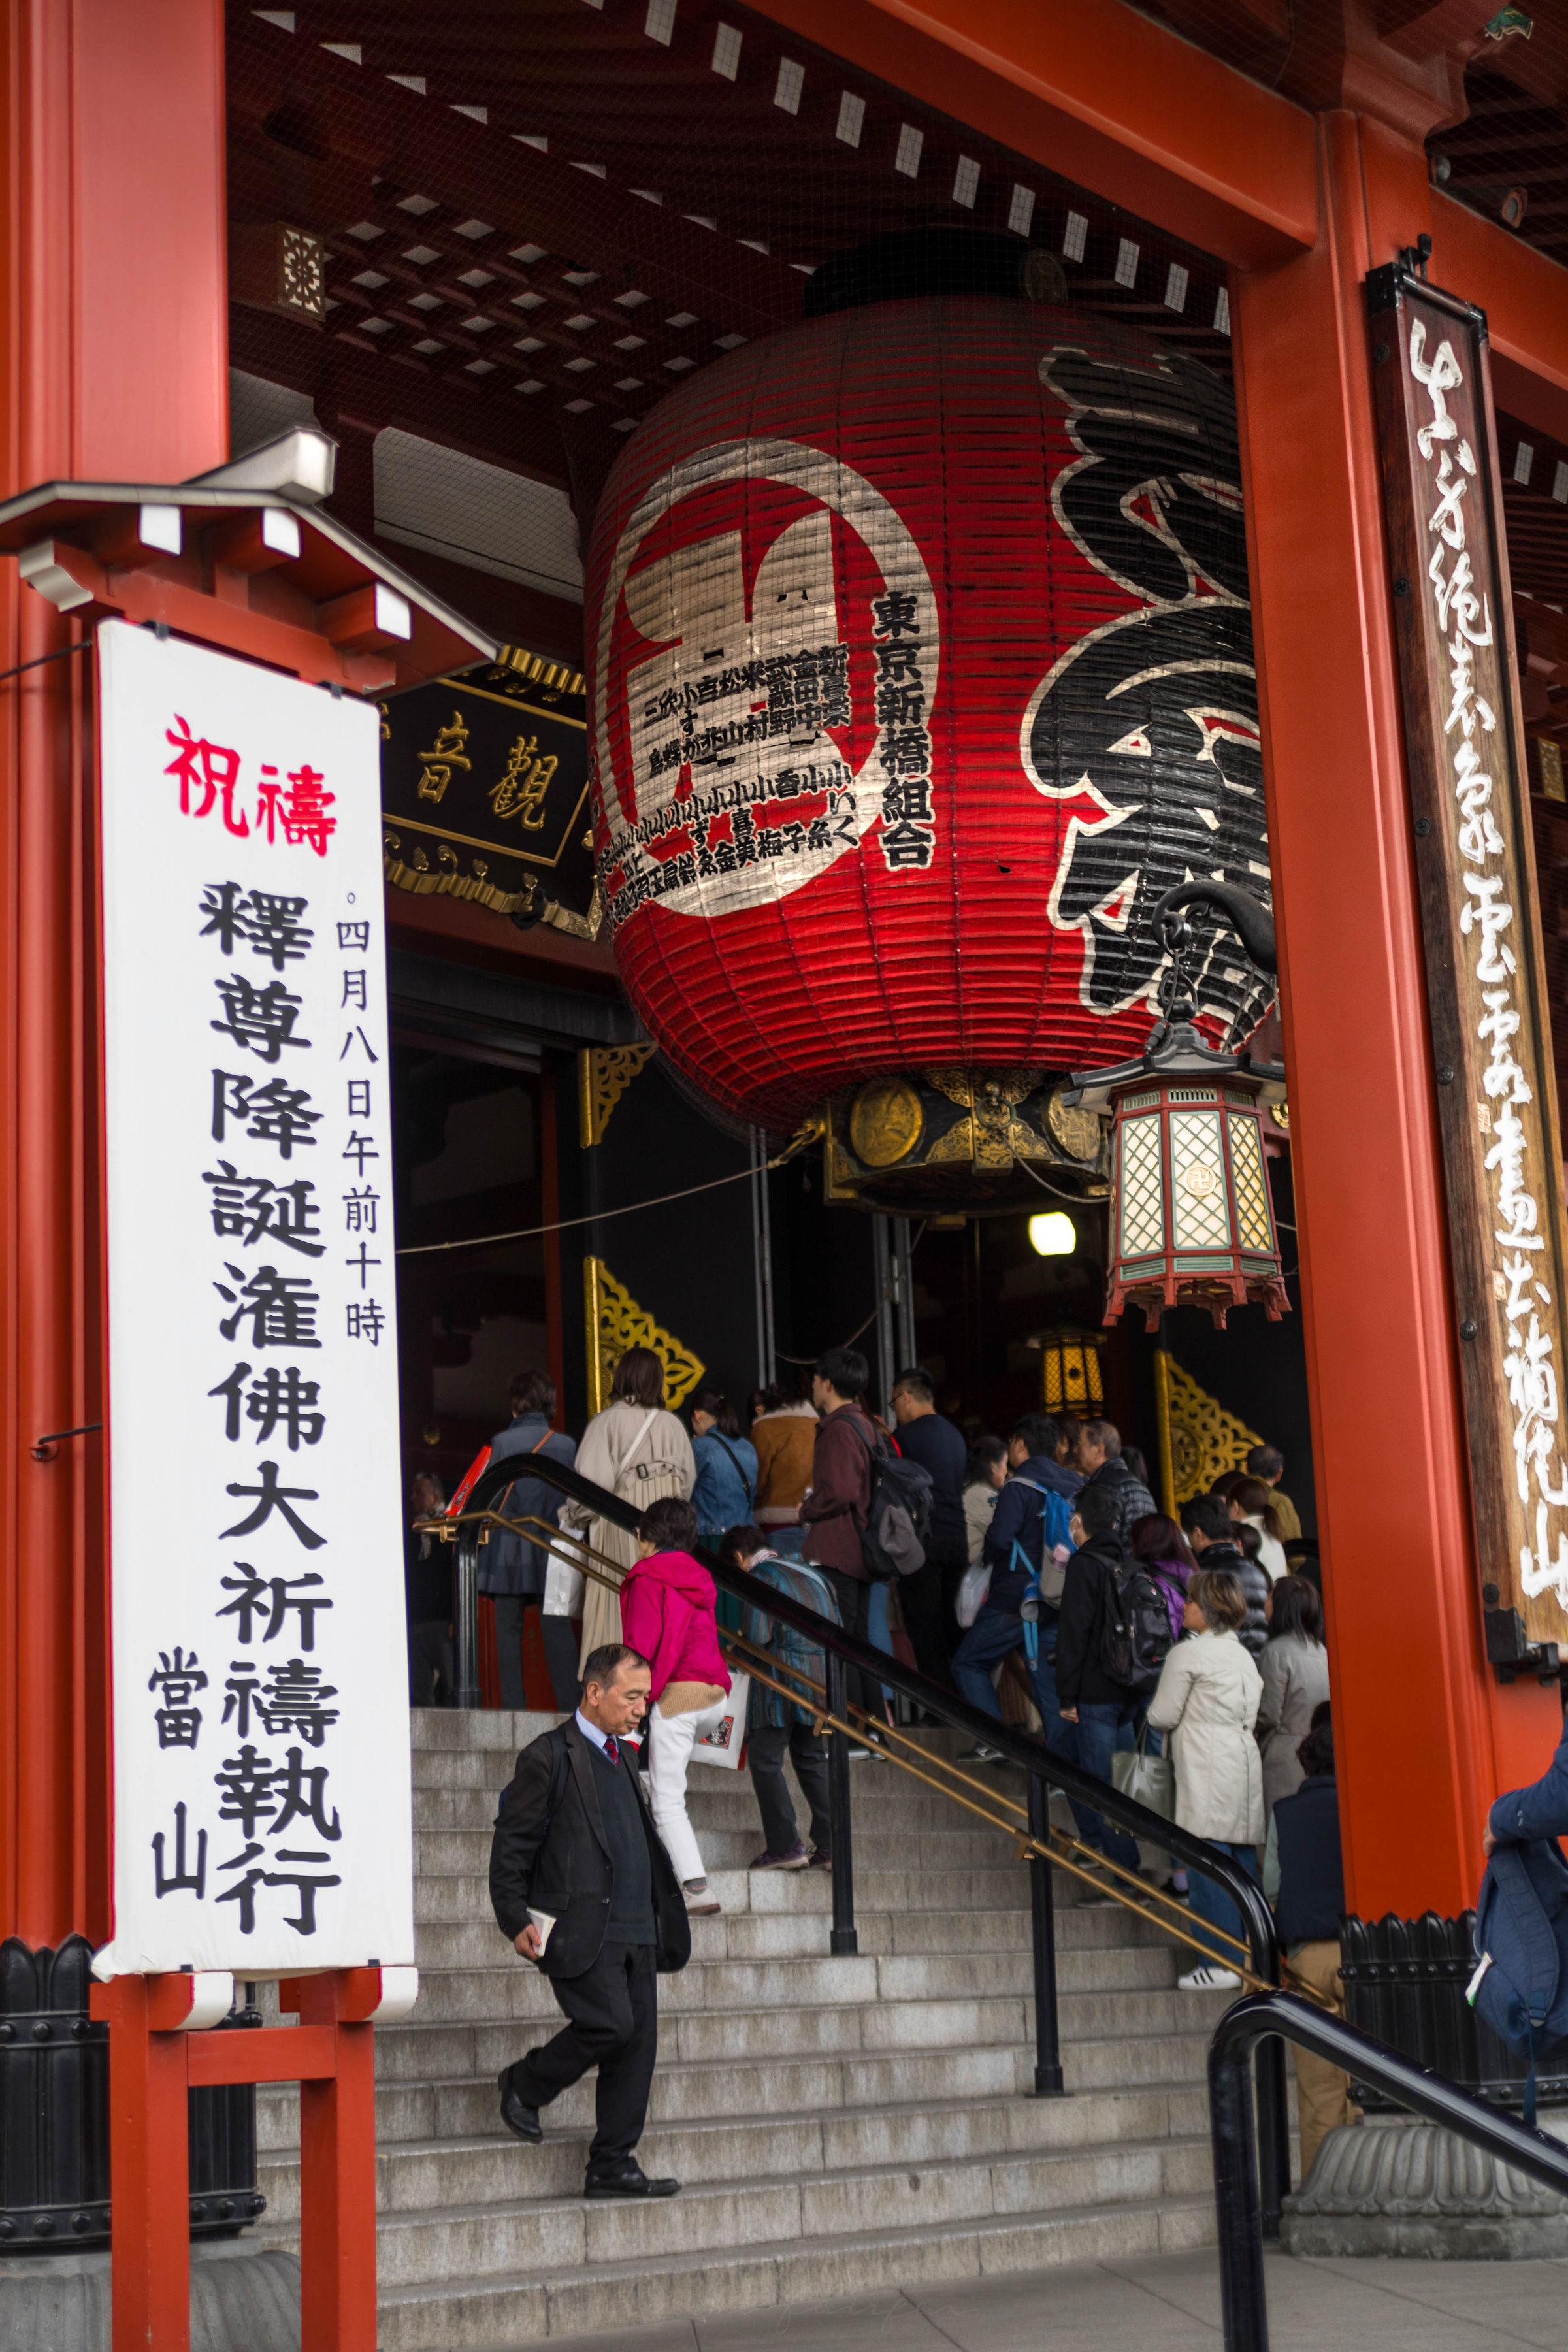 Senso-Ji Temple Asakusa Kannon Buddhist Temple in Tokyo, Japan Shrine with Massive Red Japanese Paper Lanterns Near Tokyo Sky Tree Goddess of Mercy by Annie Fairfax